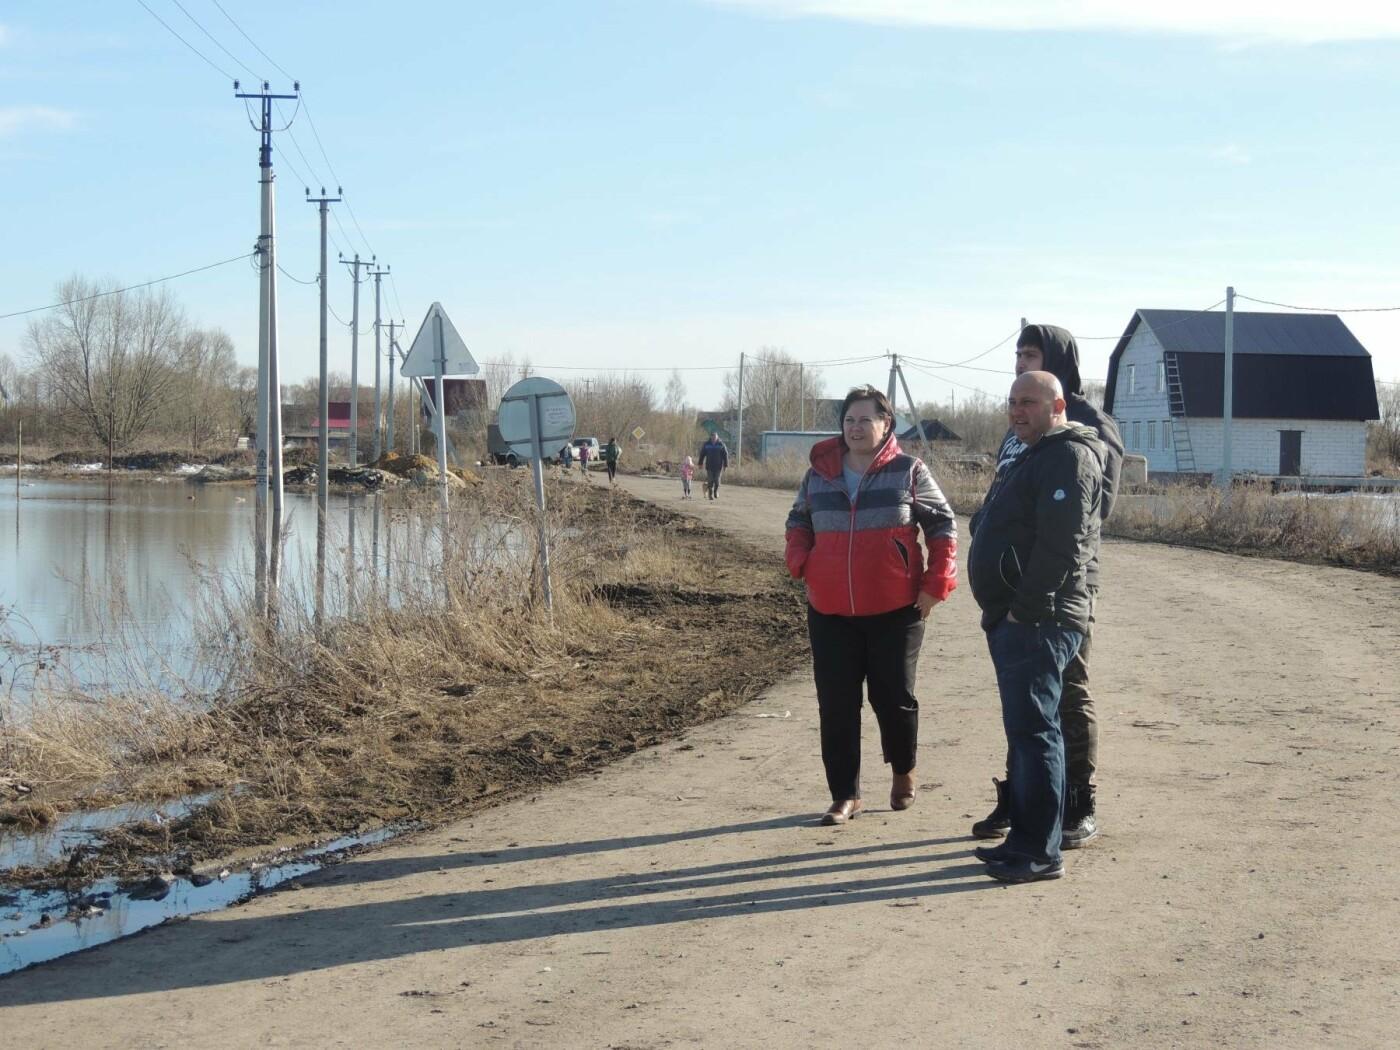 Тамбовские села отрезаны от внешнего мира паводком, фото-3